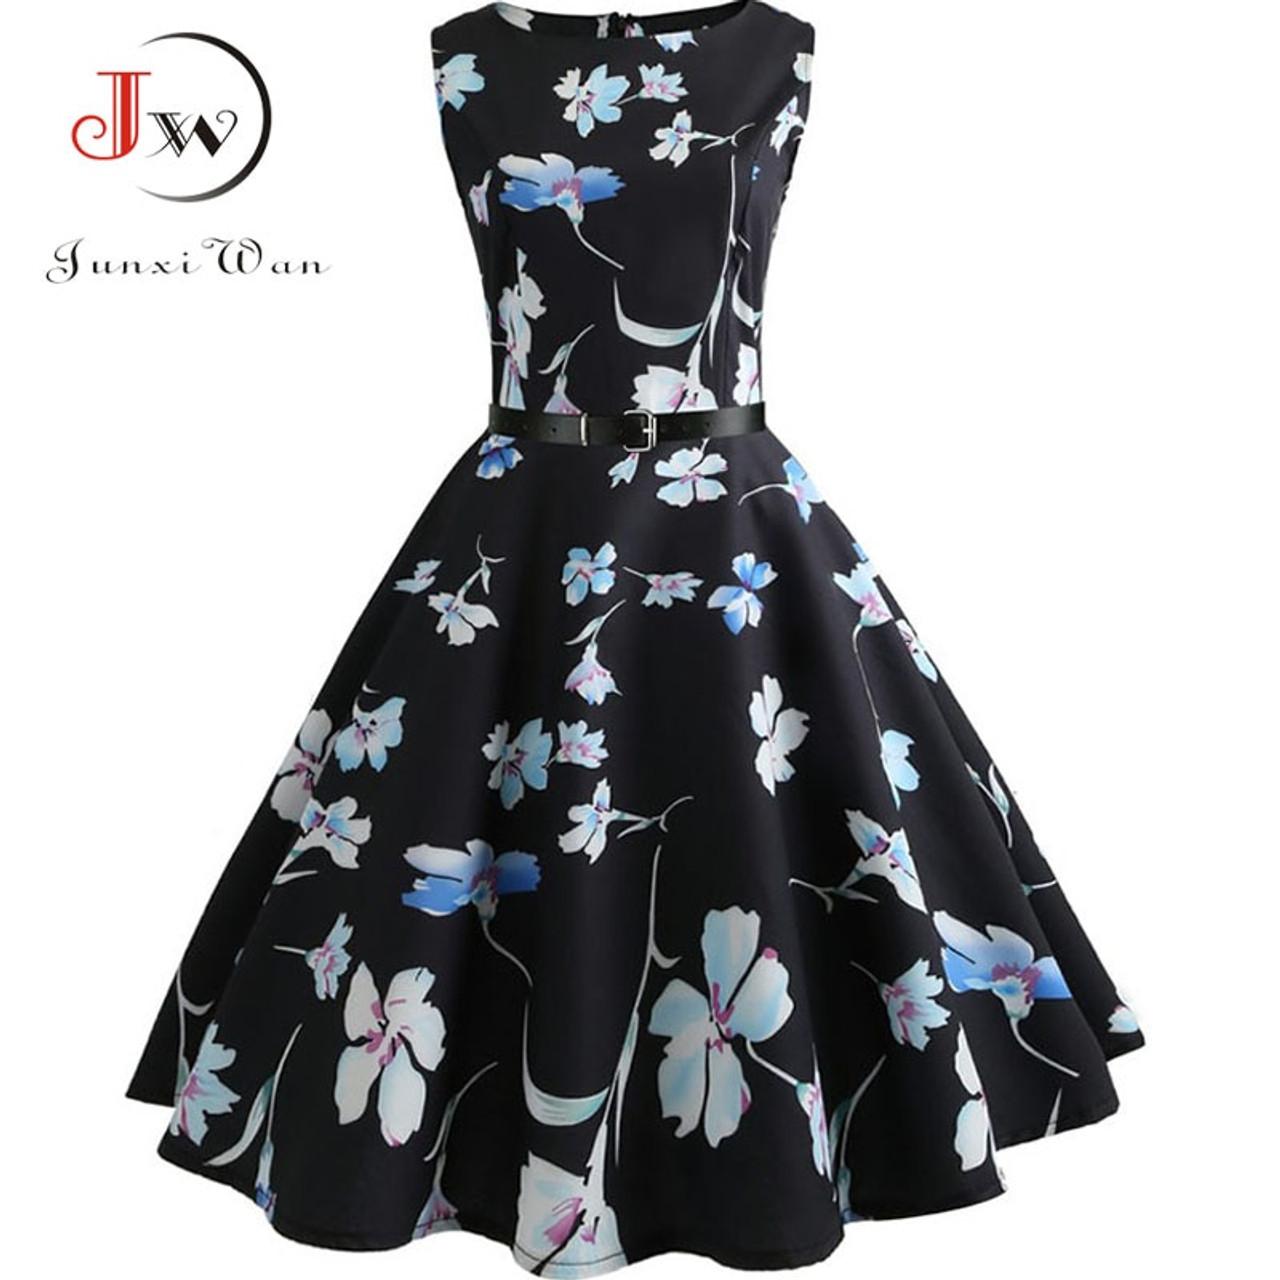 70b559bf8ac ... Floral Print Summer Dress Women 2018 Vintage Elegant Swing Rockabilly  Party Dresses Plus Size Casual Midi ...